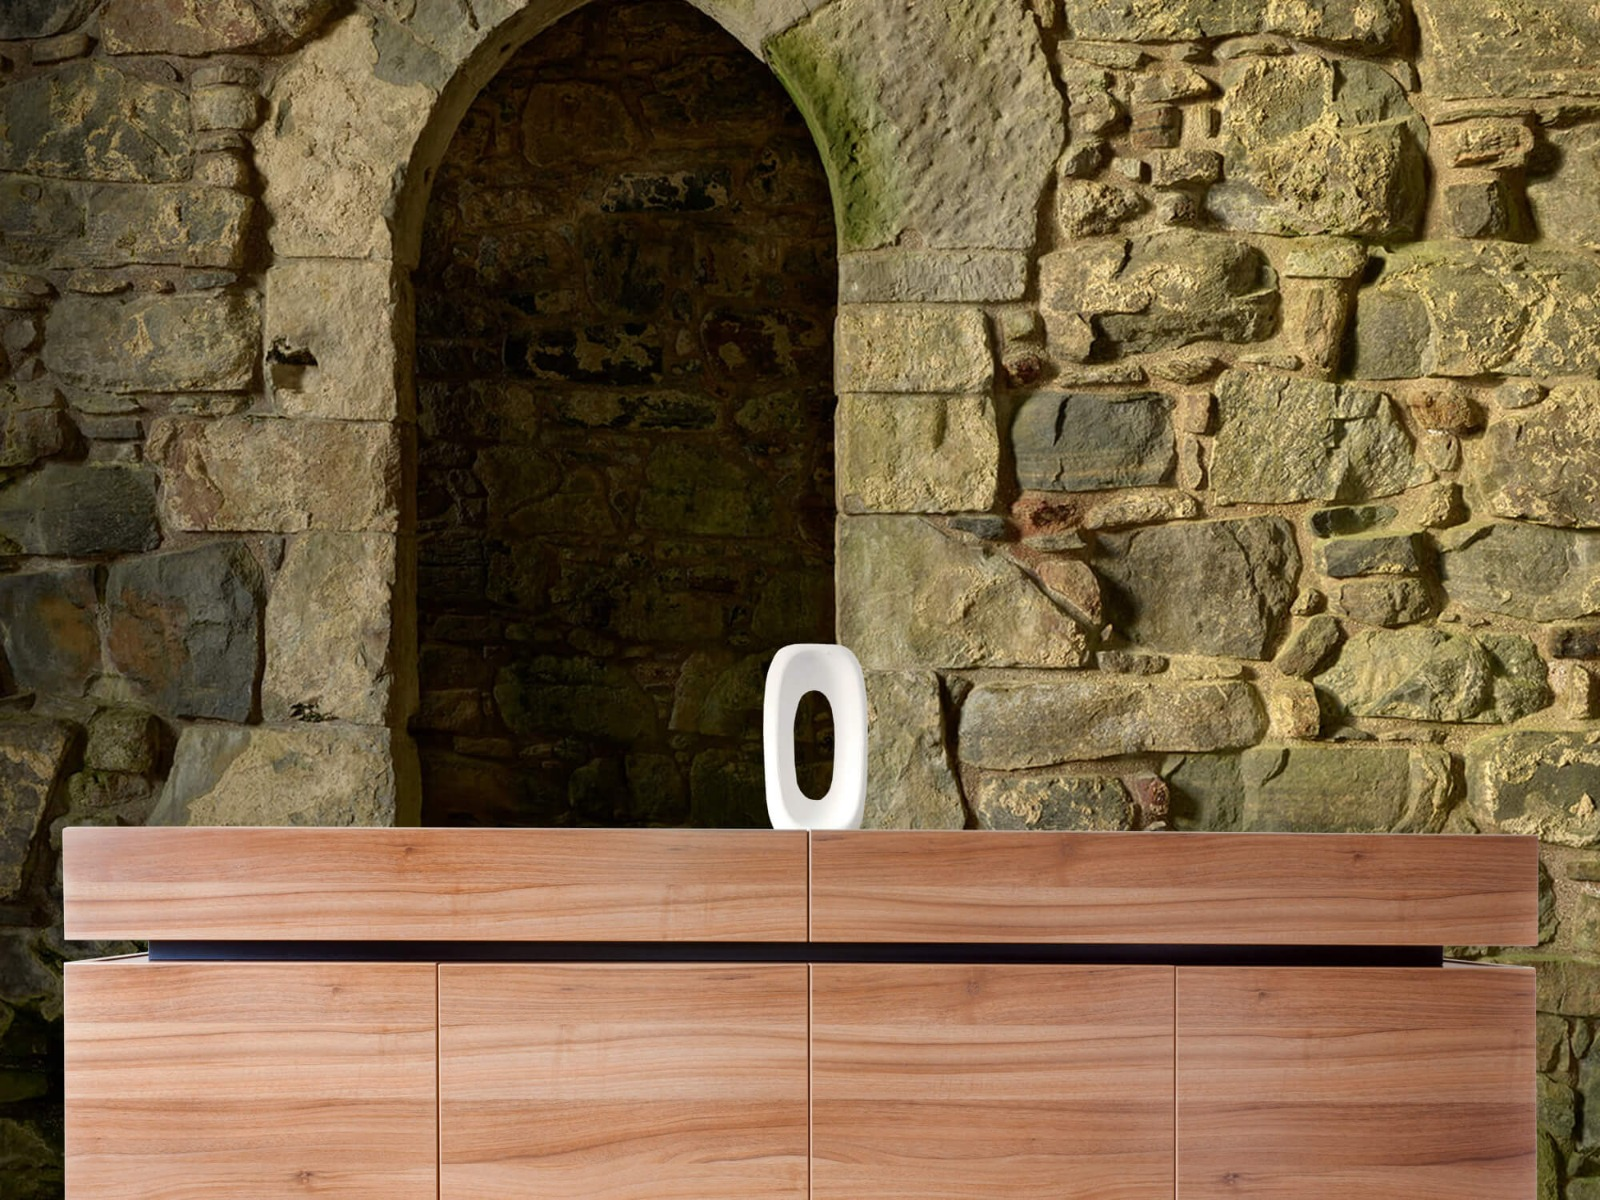 Steen behang - Oude muur met doorgang - Slaapkamer 20